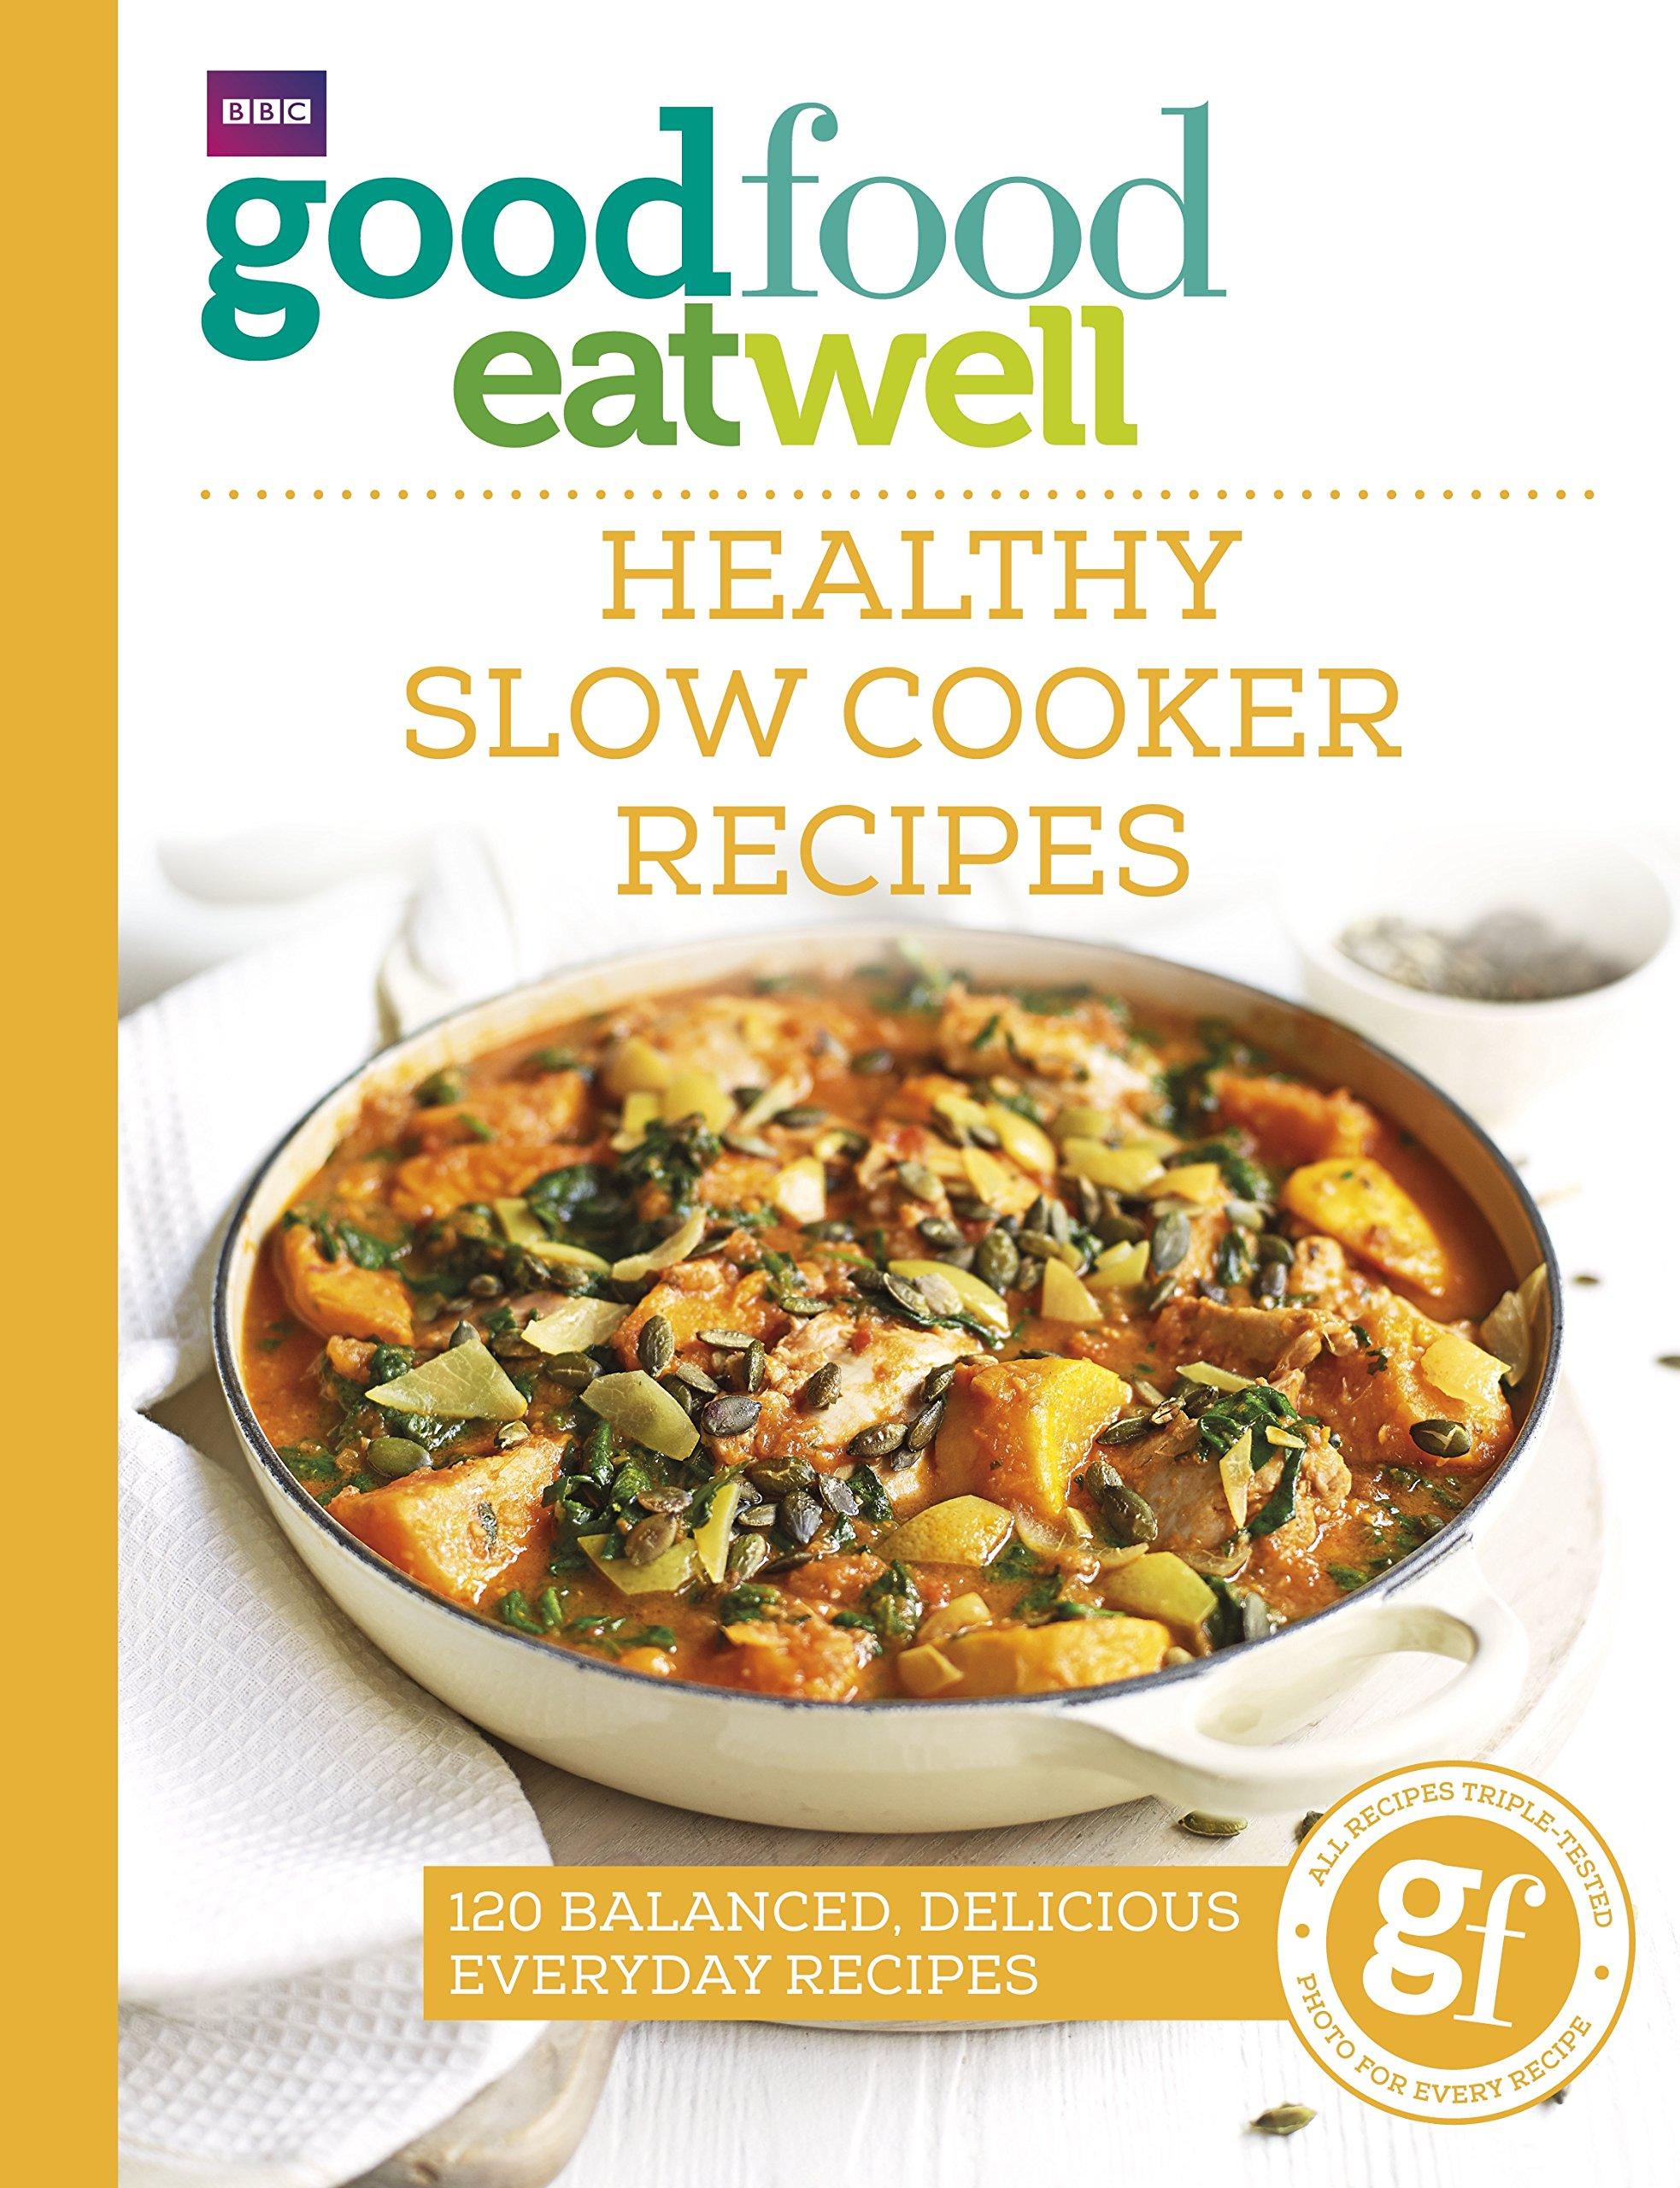 Good food eat well healthy slow cooker recipes amazon jo good food eat well healthy slow cooker recipes amazon jo scarratt jones 9781785941986 books forumfinder Choice Image